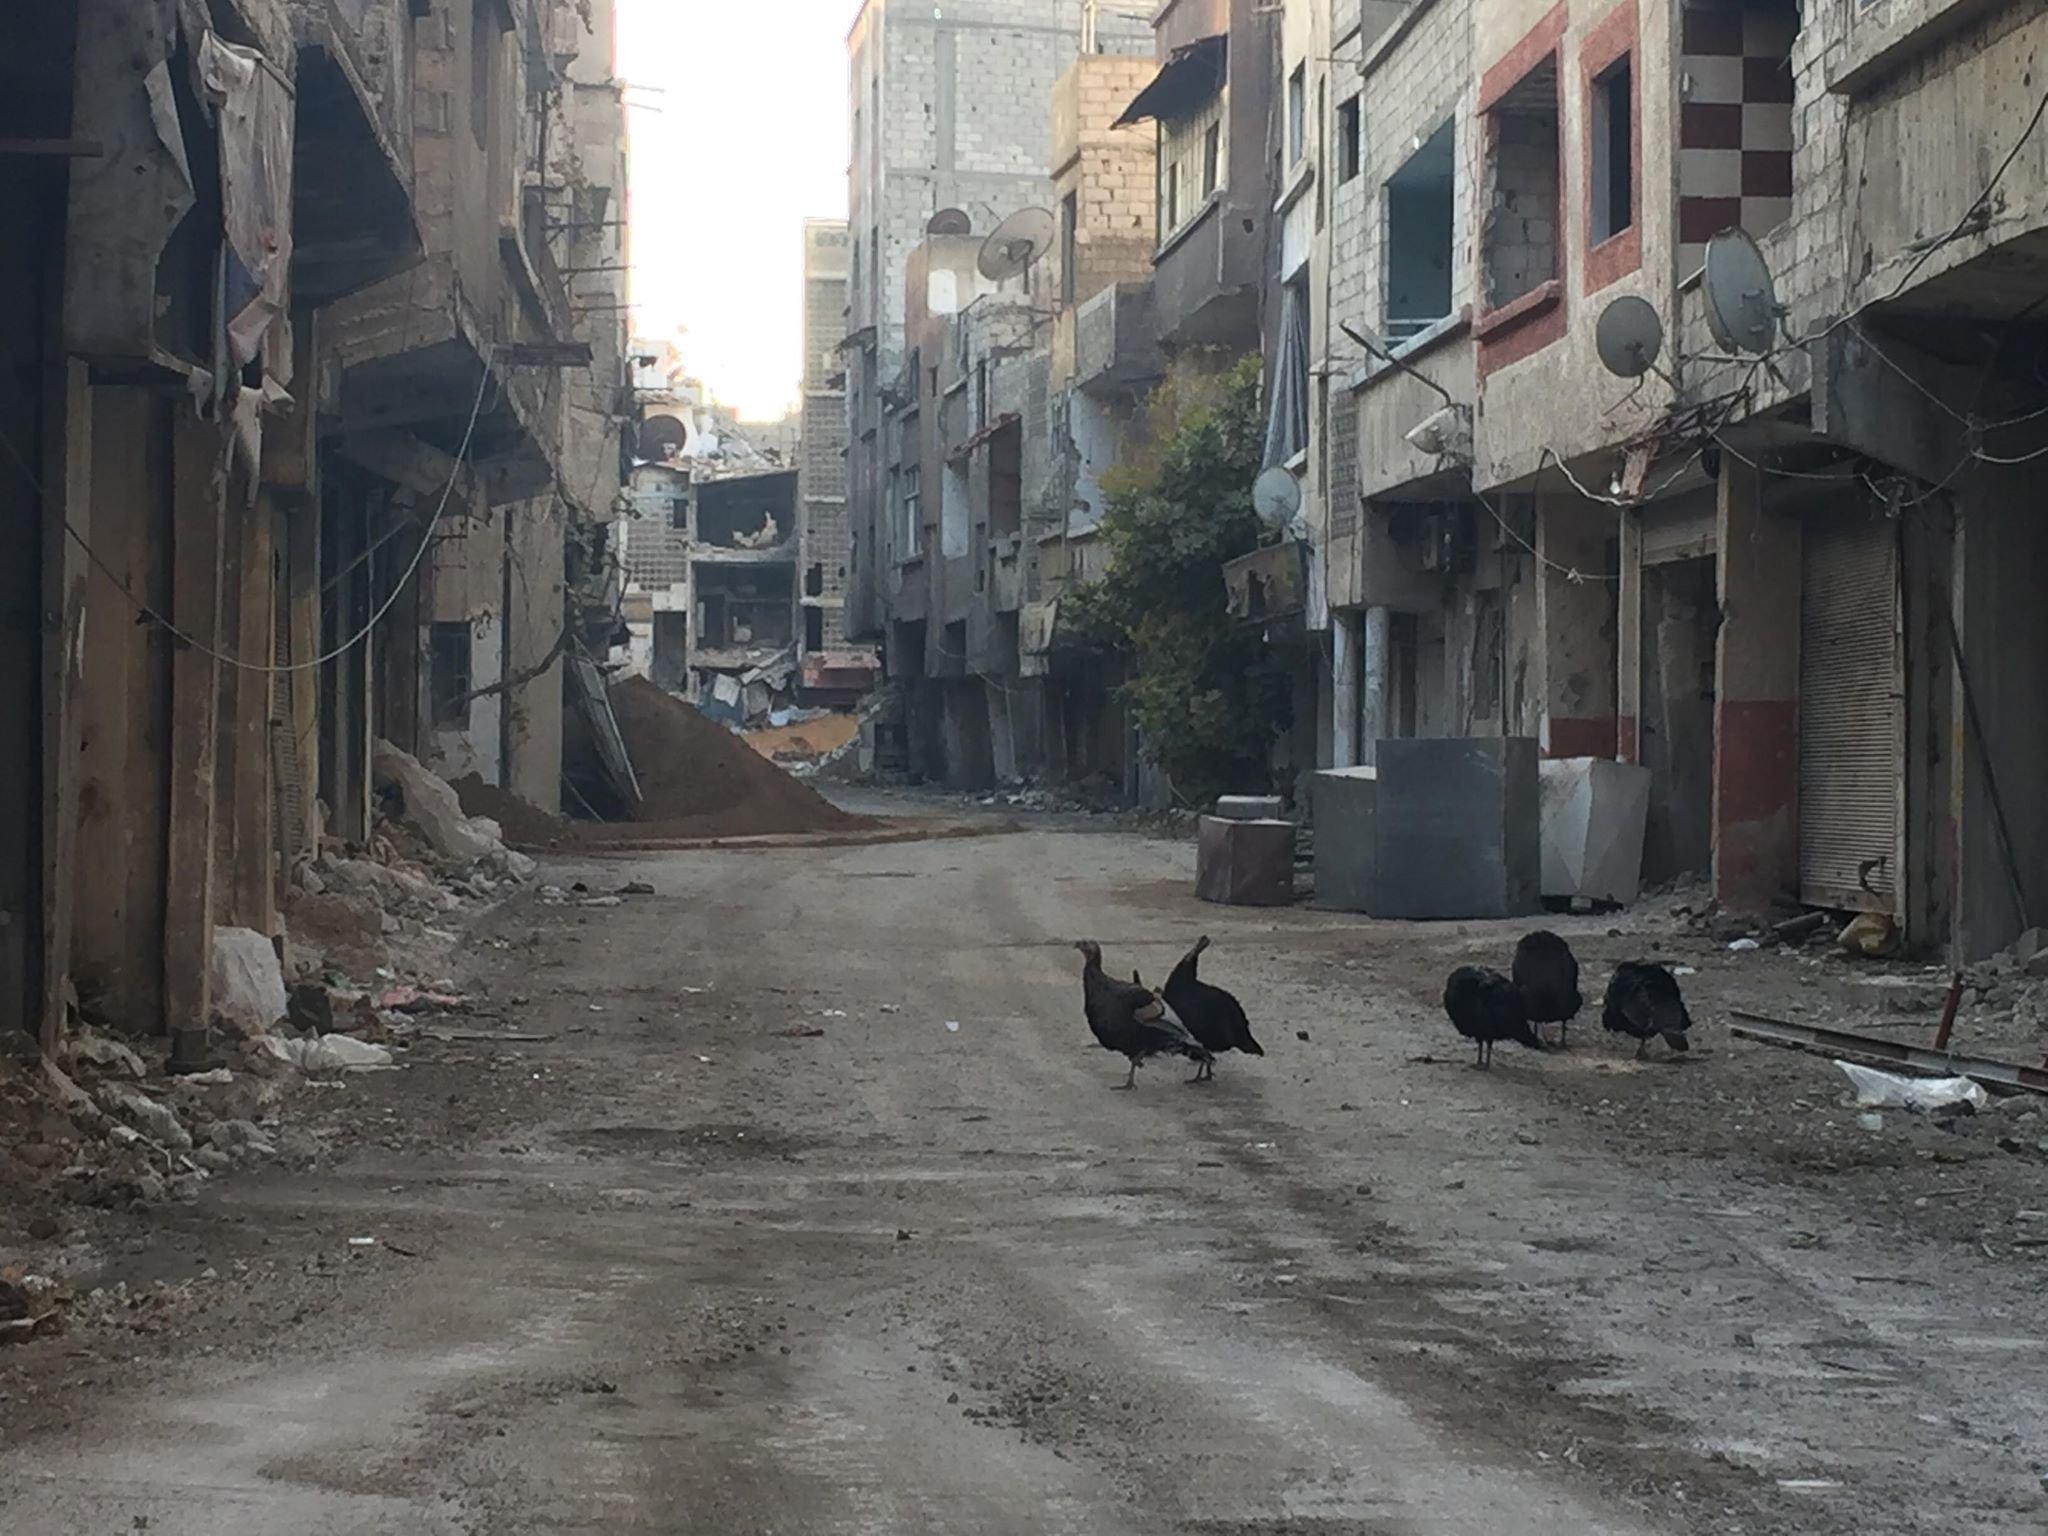 Tension Escalating Near Damascus as Syrian Army Battles Militants